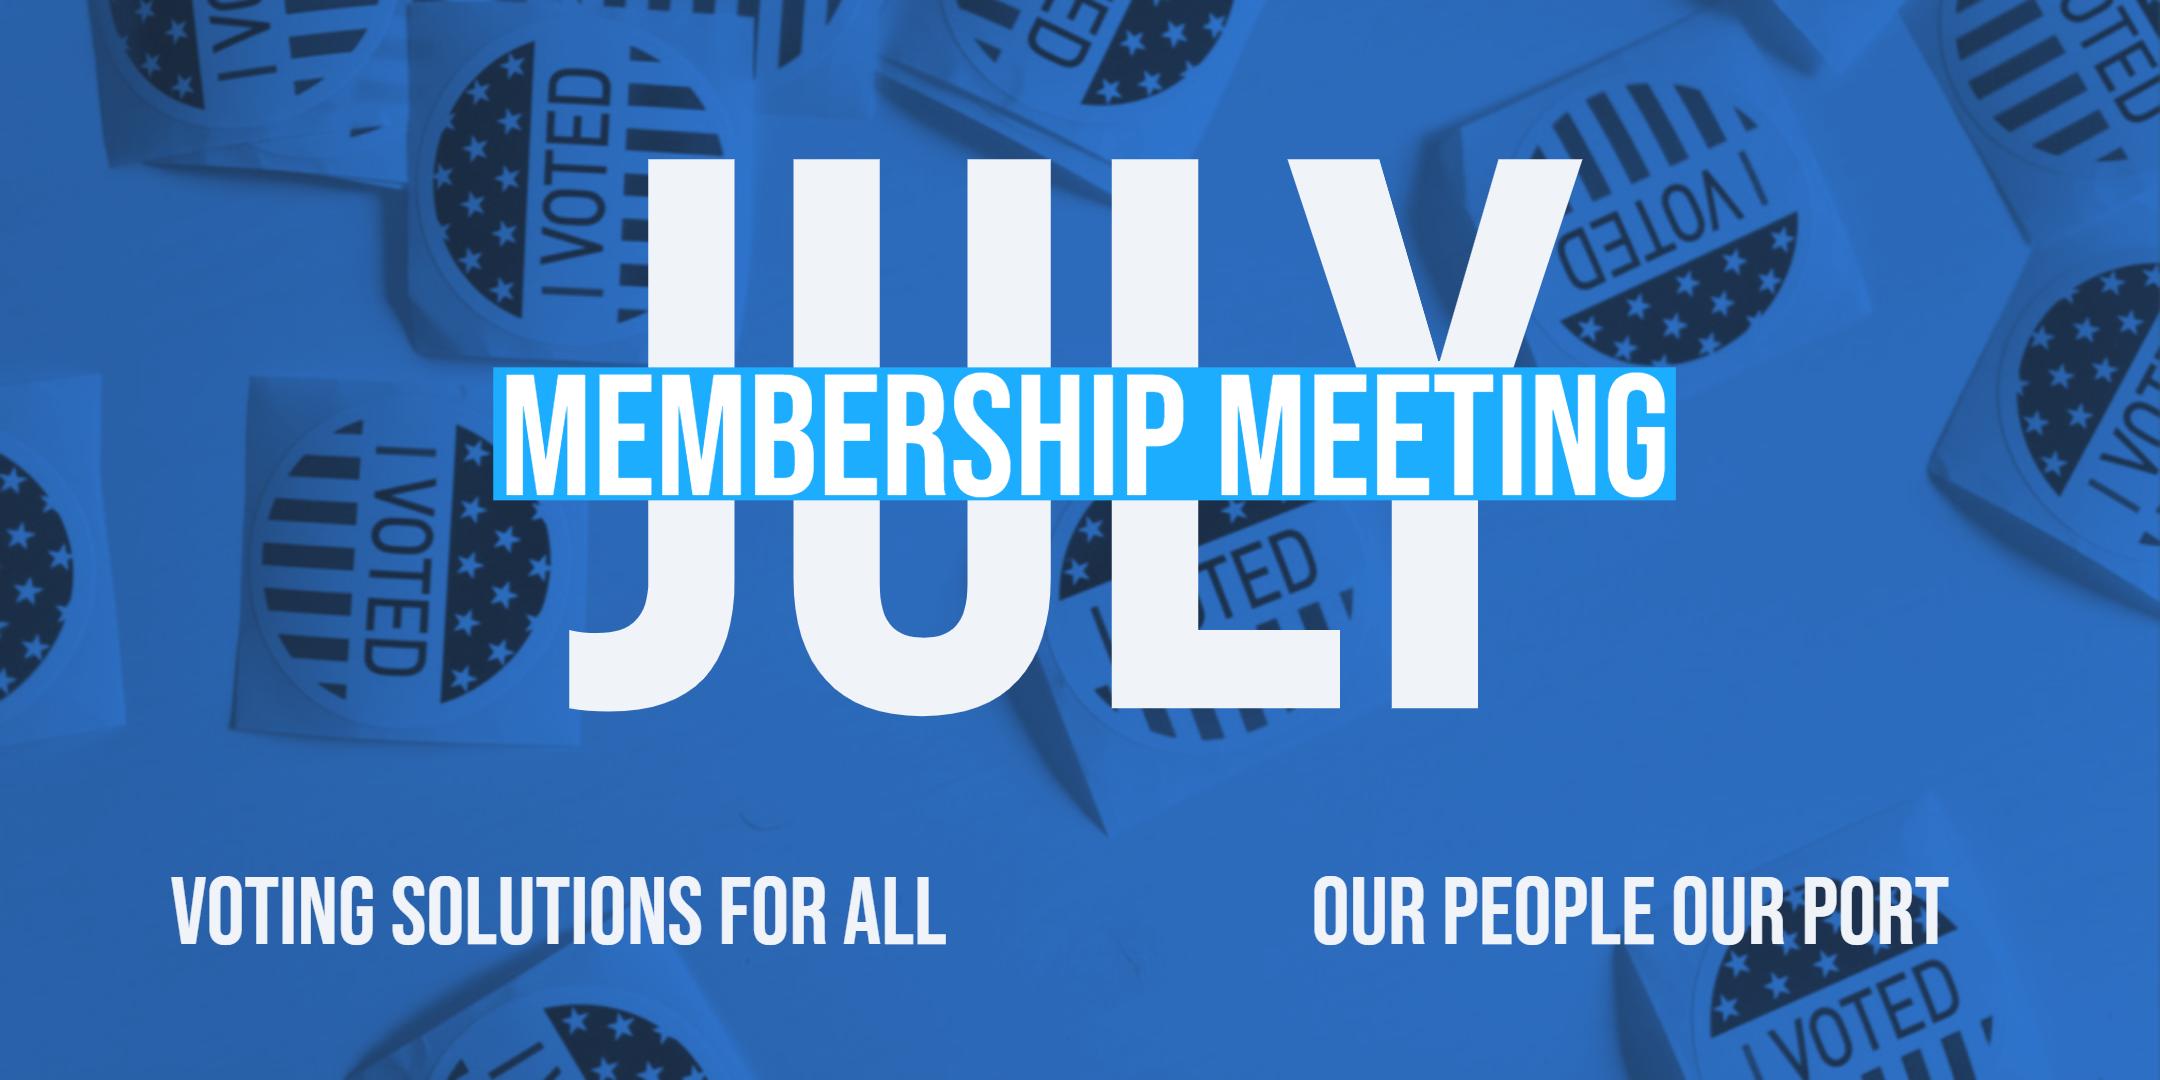 july 2019 membership meeting